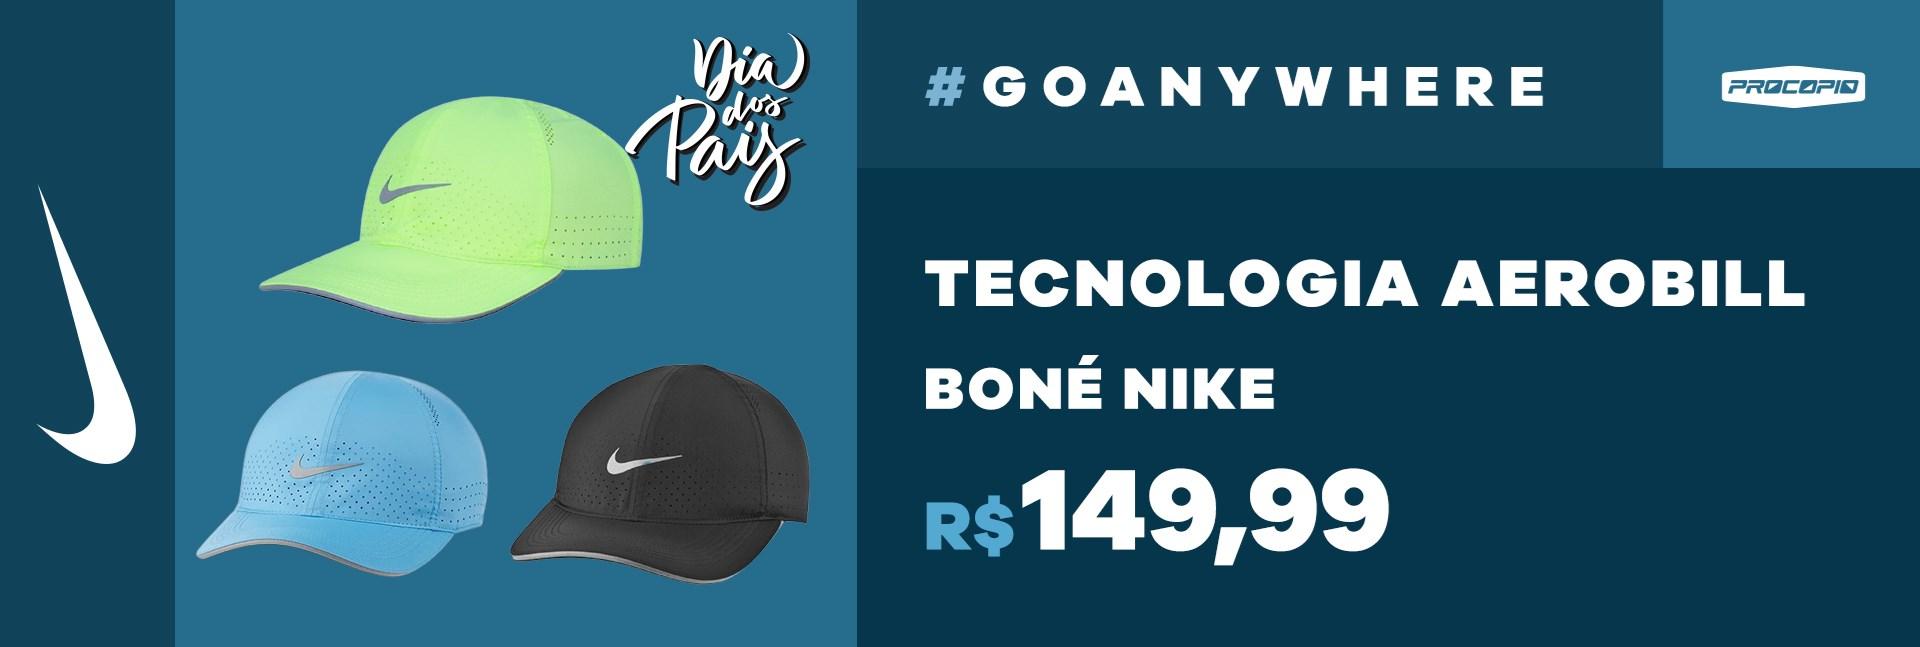 Boné Nike Dry-FIT Arobill Feather Llight